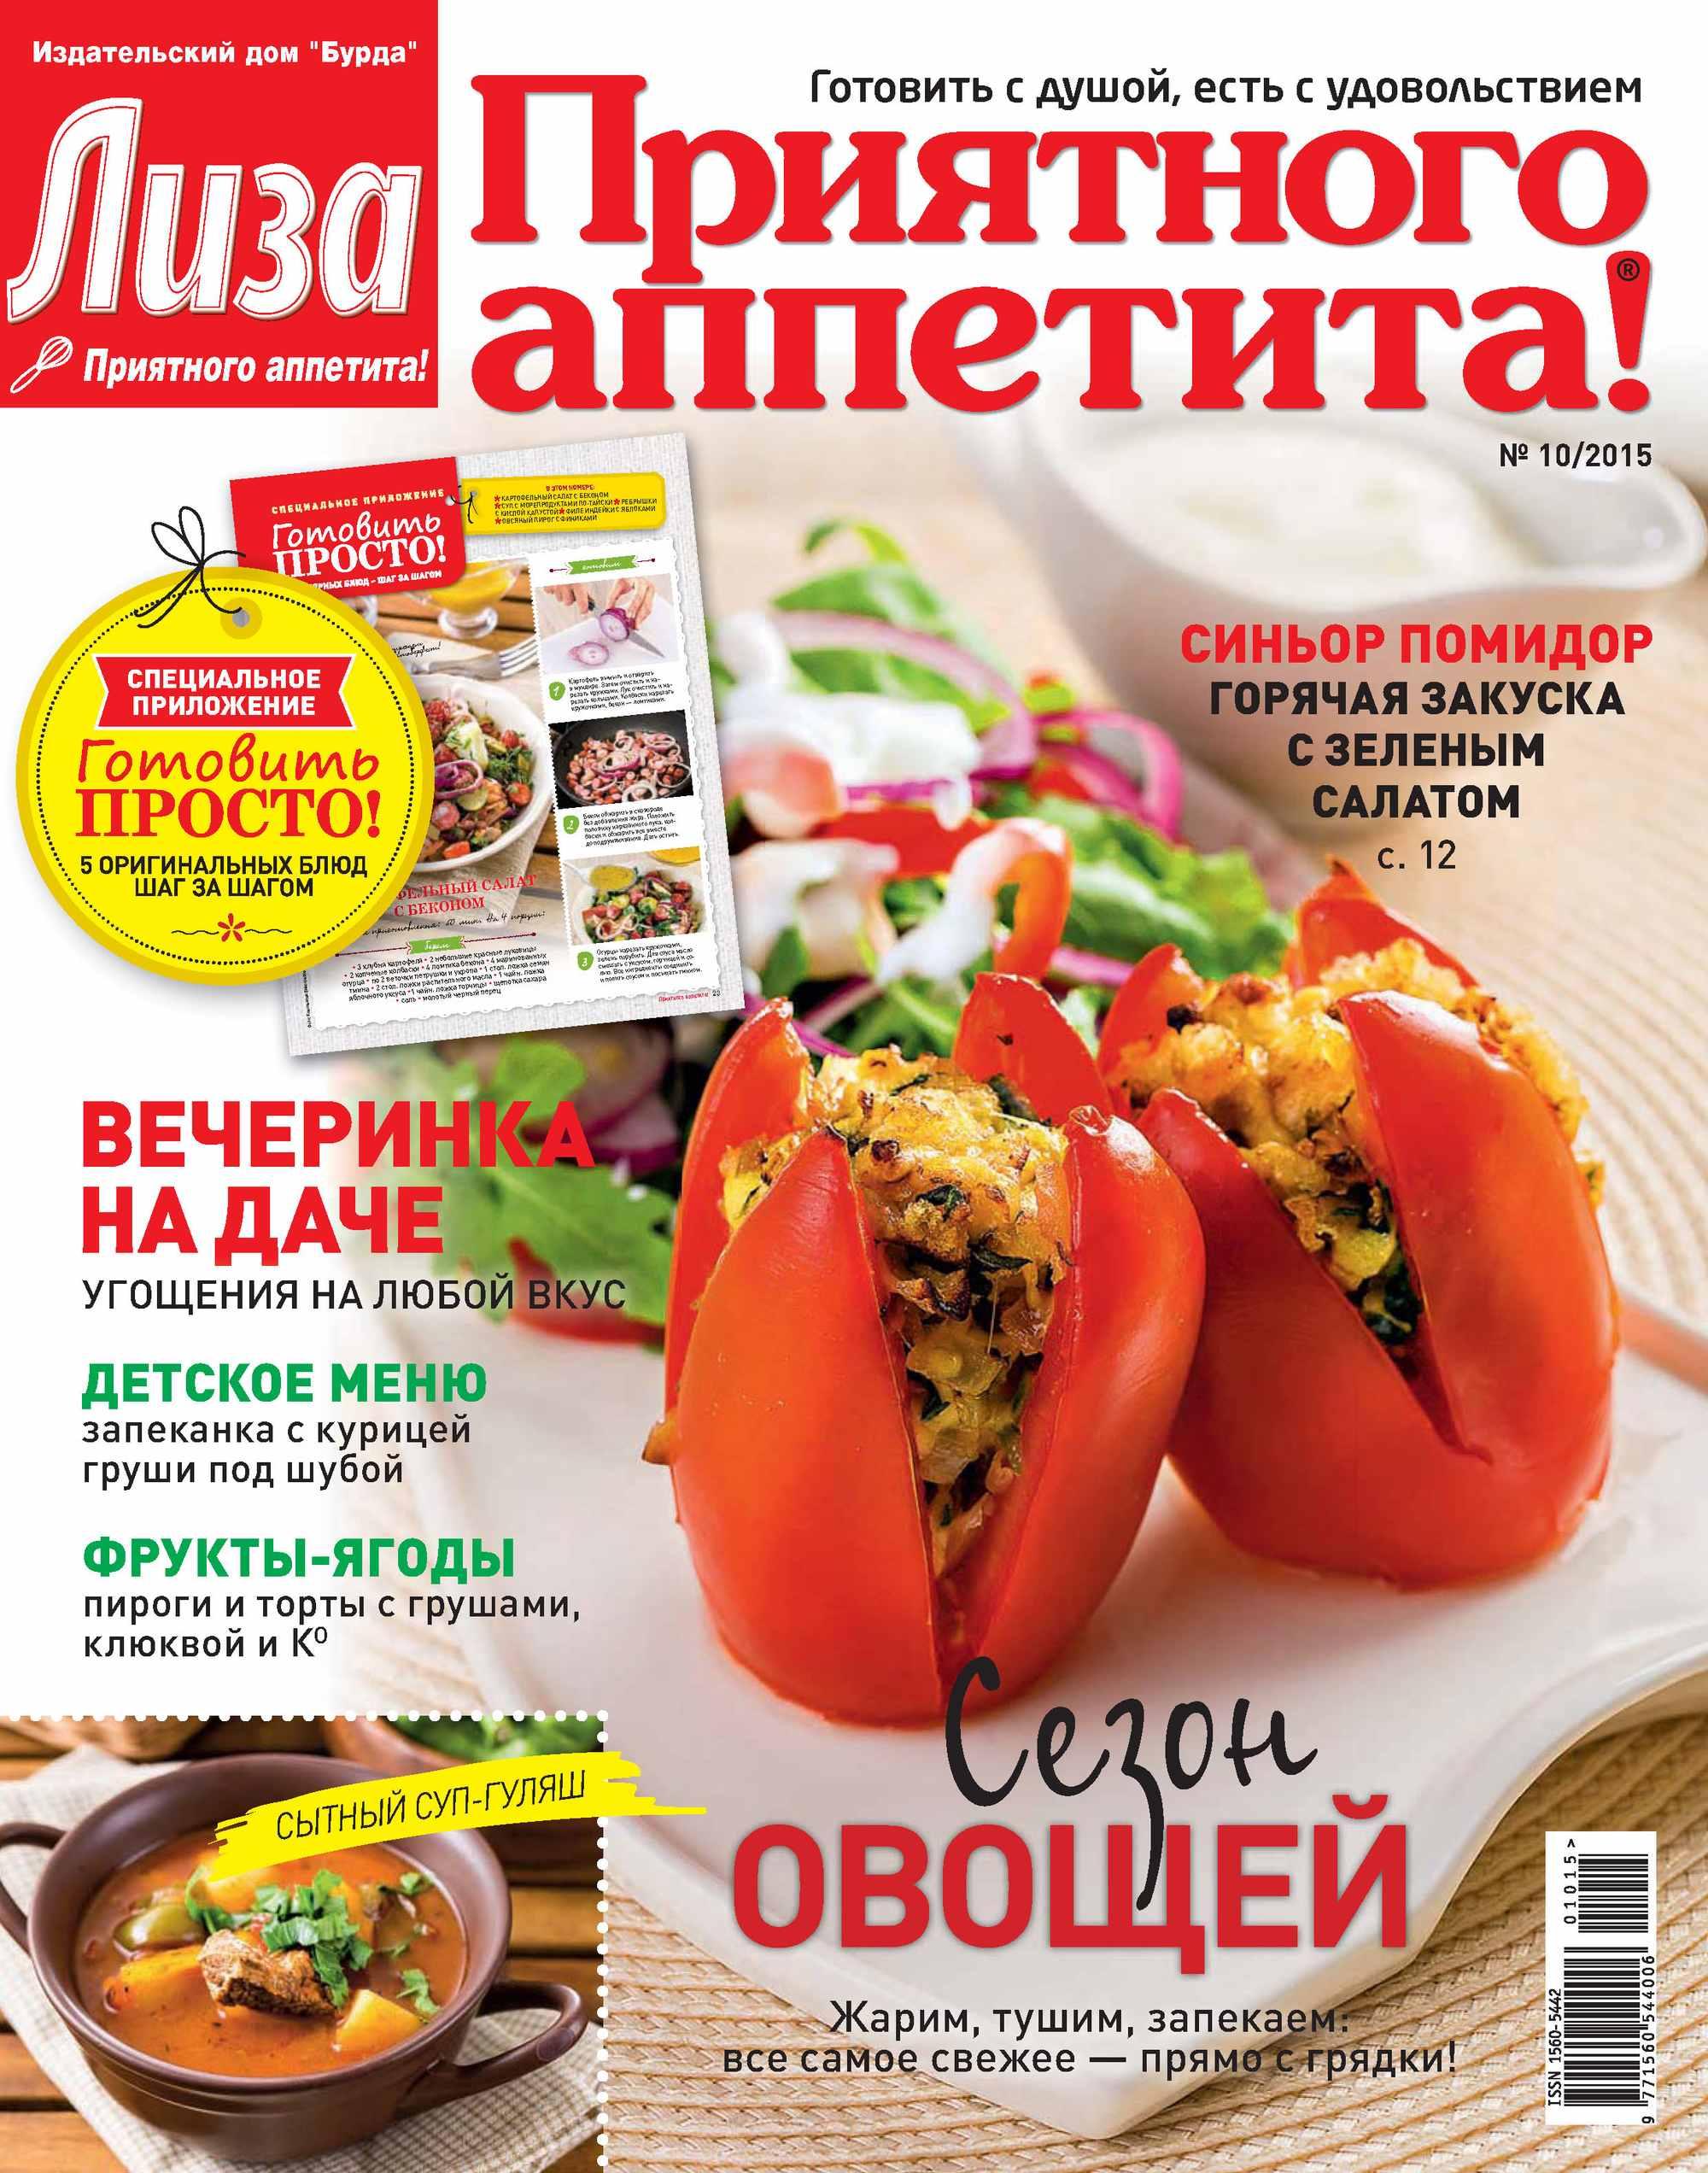 ИД «Бурда» Журнал «Лиза. Приятного аппетита» №10/2015 ид бурда журнал лиза приятного аппетита 04 2015